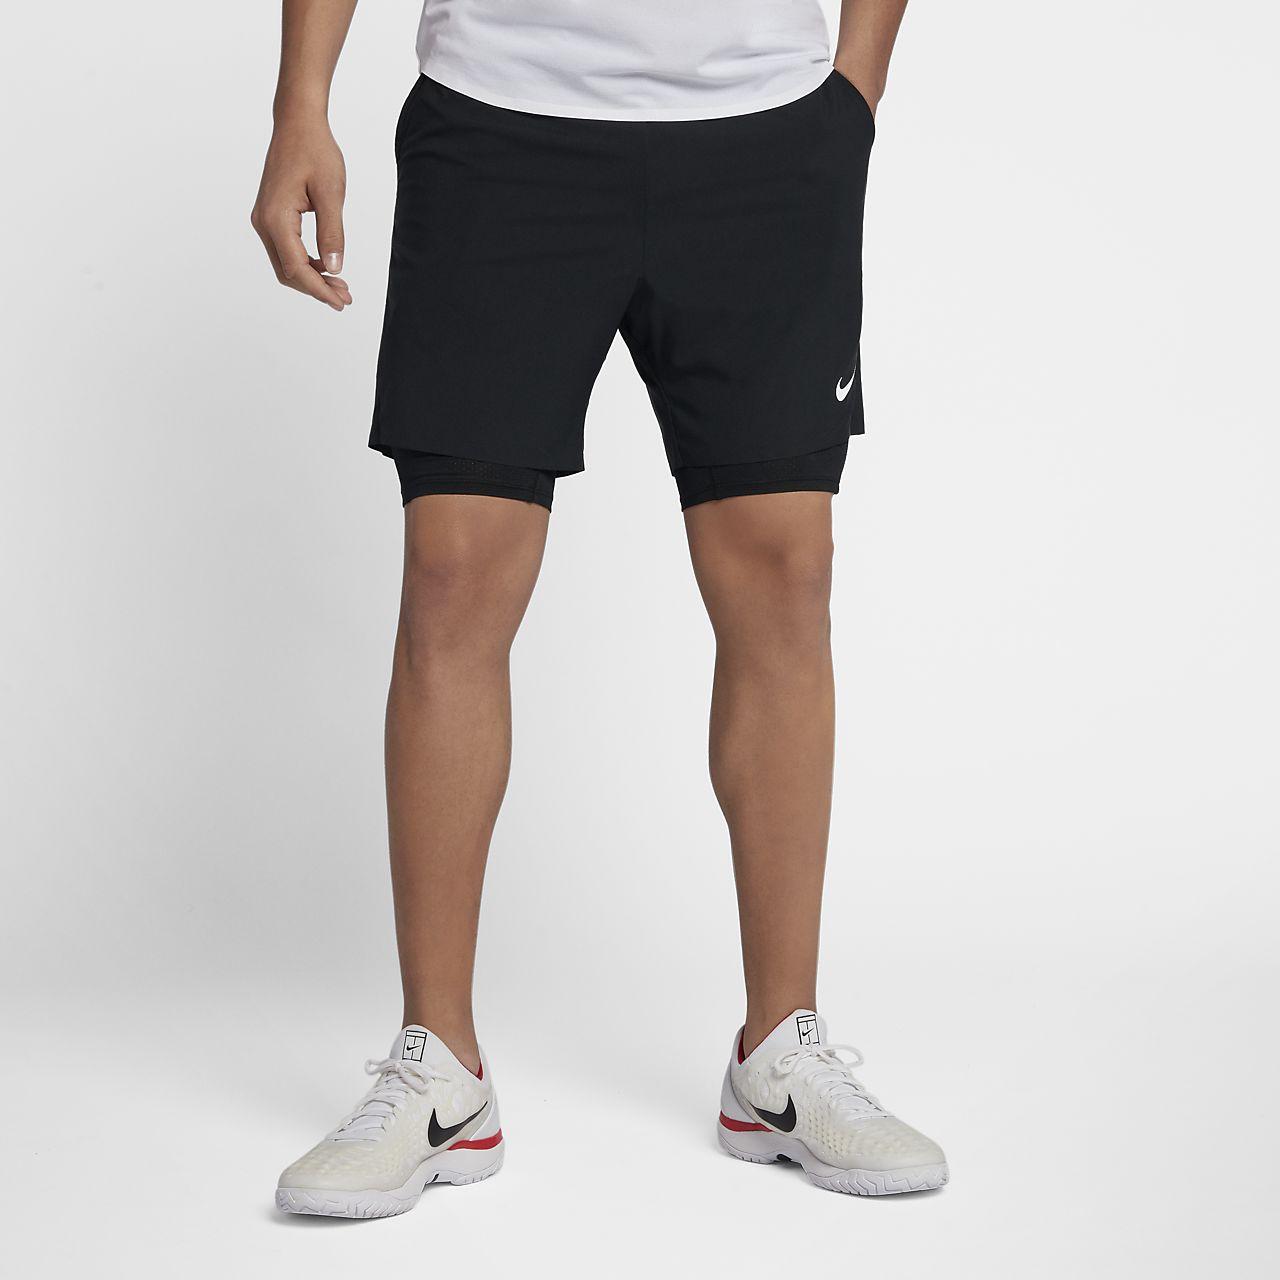 086f3e0e76e NikeCourt Flex Ace Tennisshorts van 18 cm voor heren. Nike.com BE